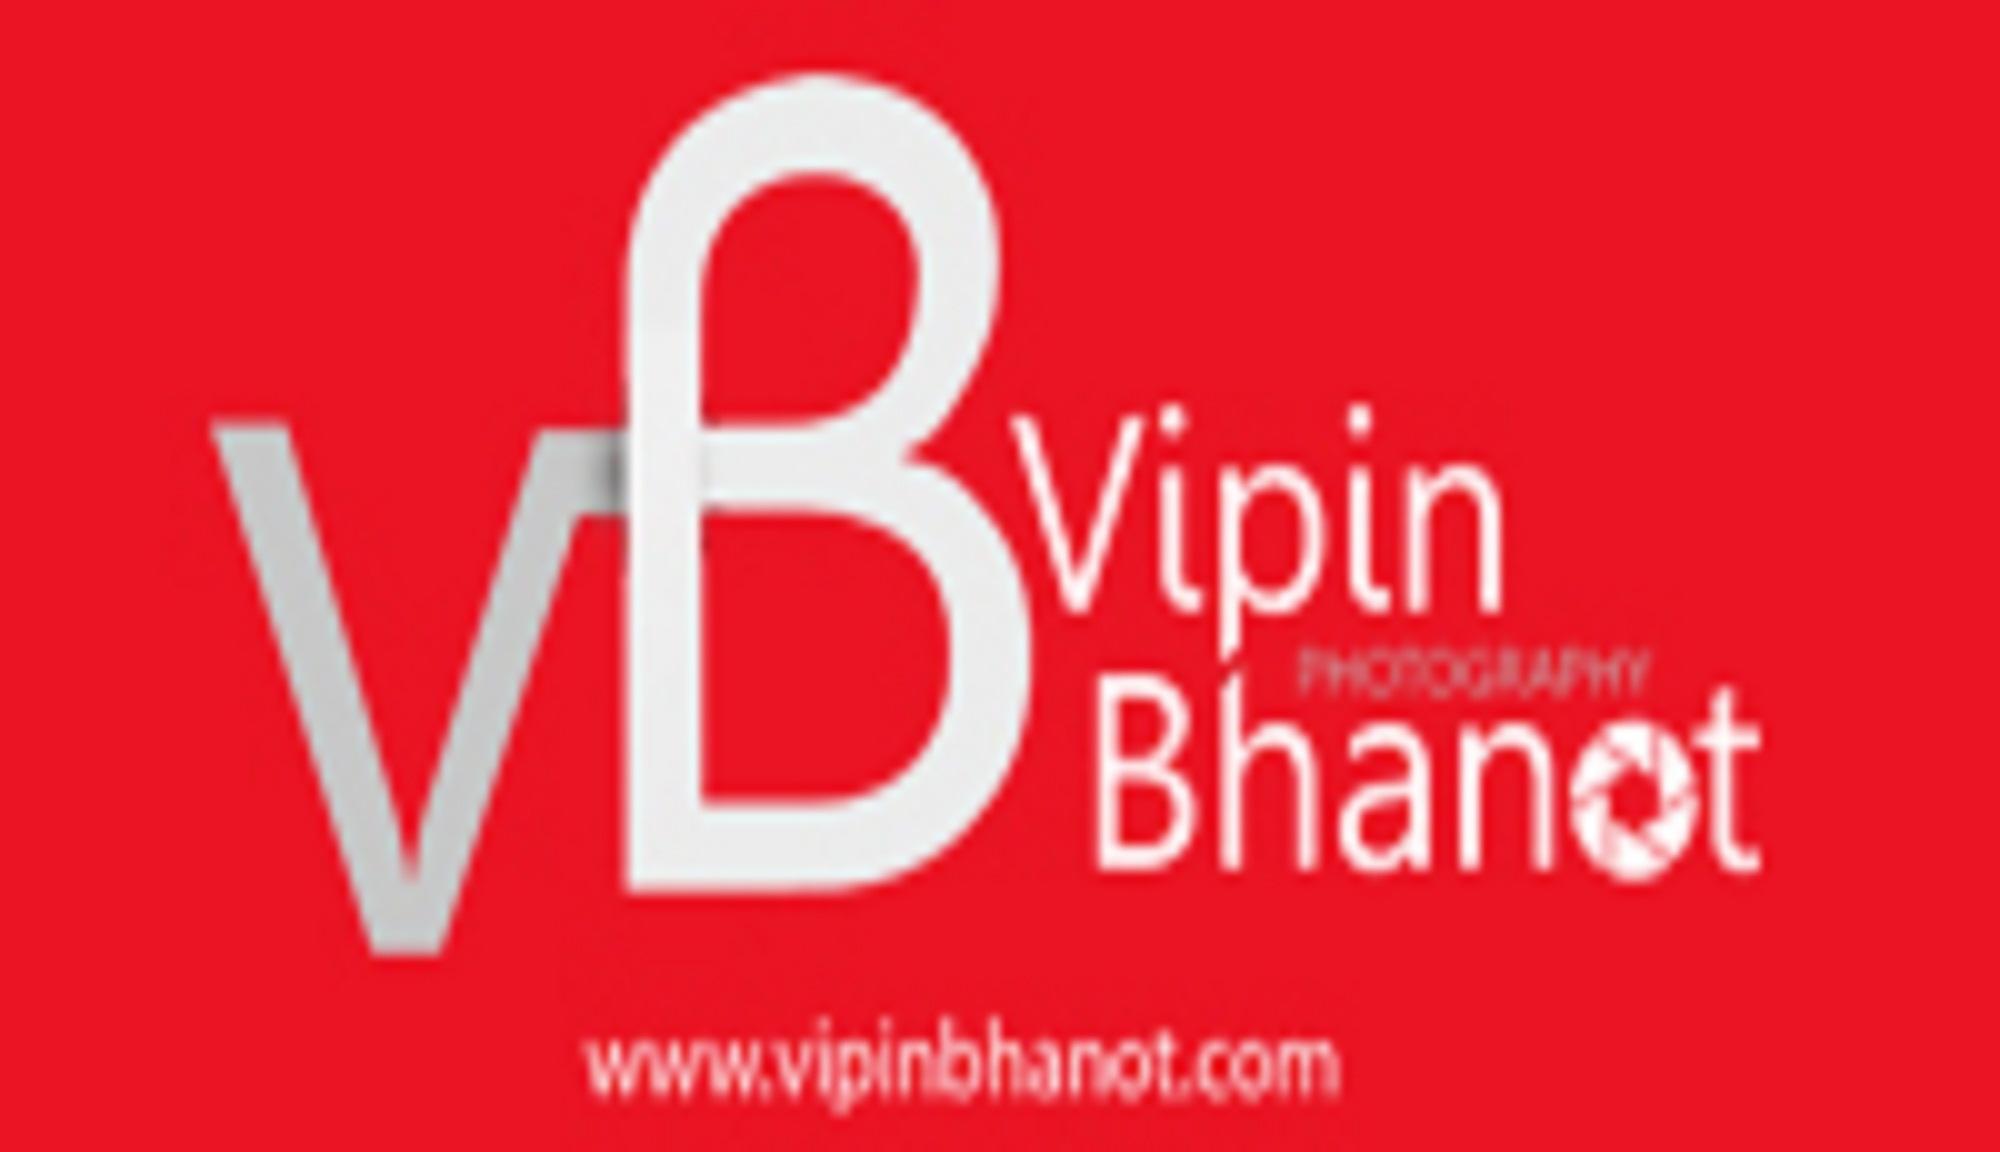 Image for Vipin Bhanot Wedding Photographer in Chandigarh Mohali